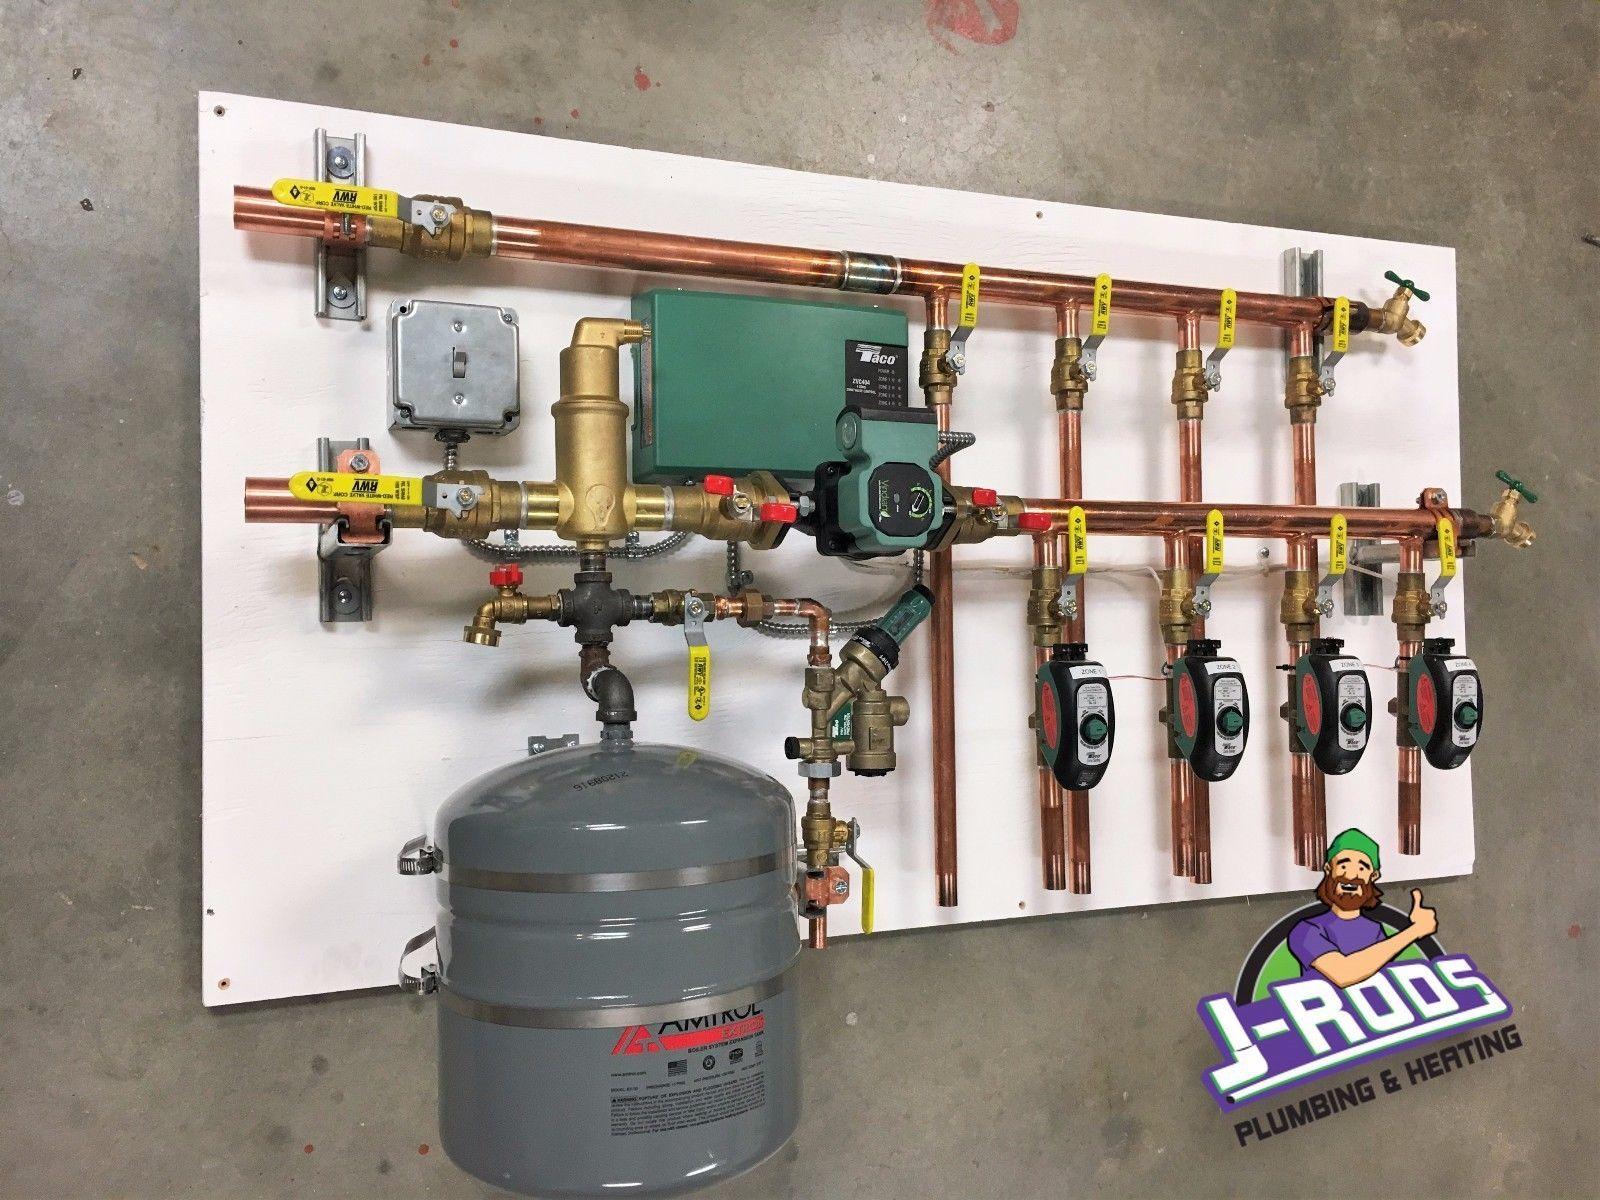 Radiant Heat Boiler Control Panel 4 Zone Radiant Heat Home Appliances Home Improvement